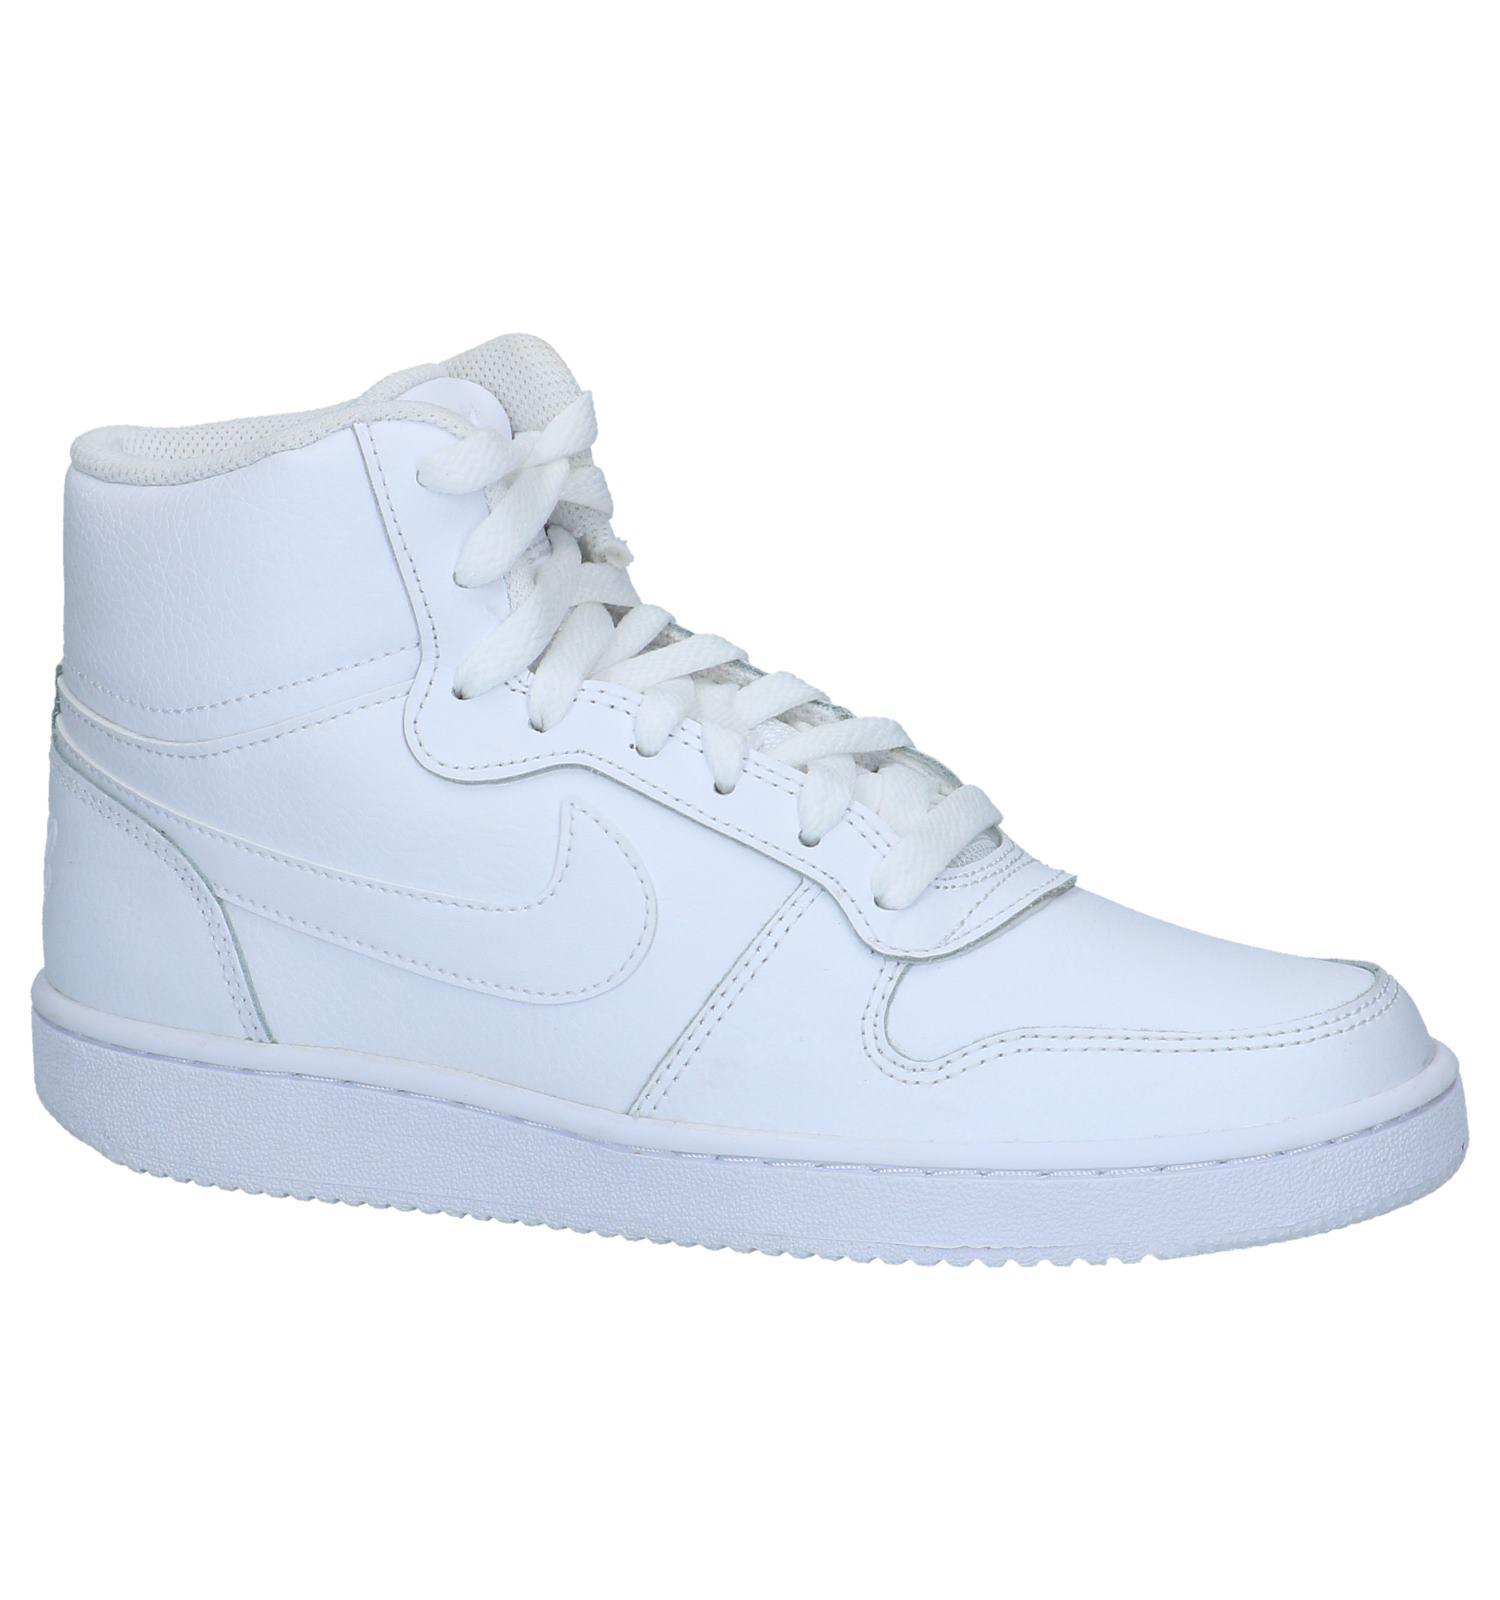 Nike Ebernon Mid Witte Hoge Sneakers | TORFS.BE | Gratis verzend en retour